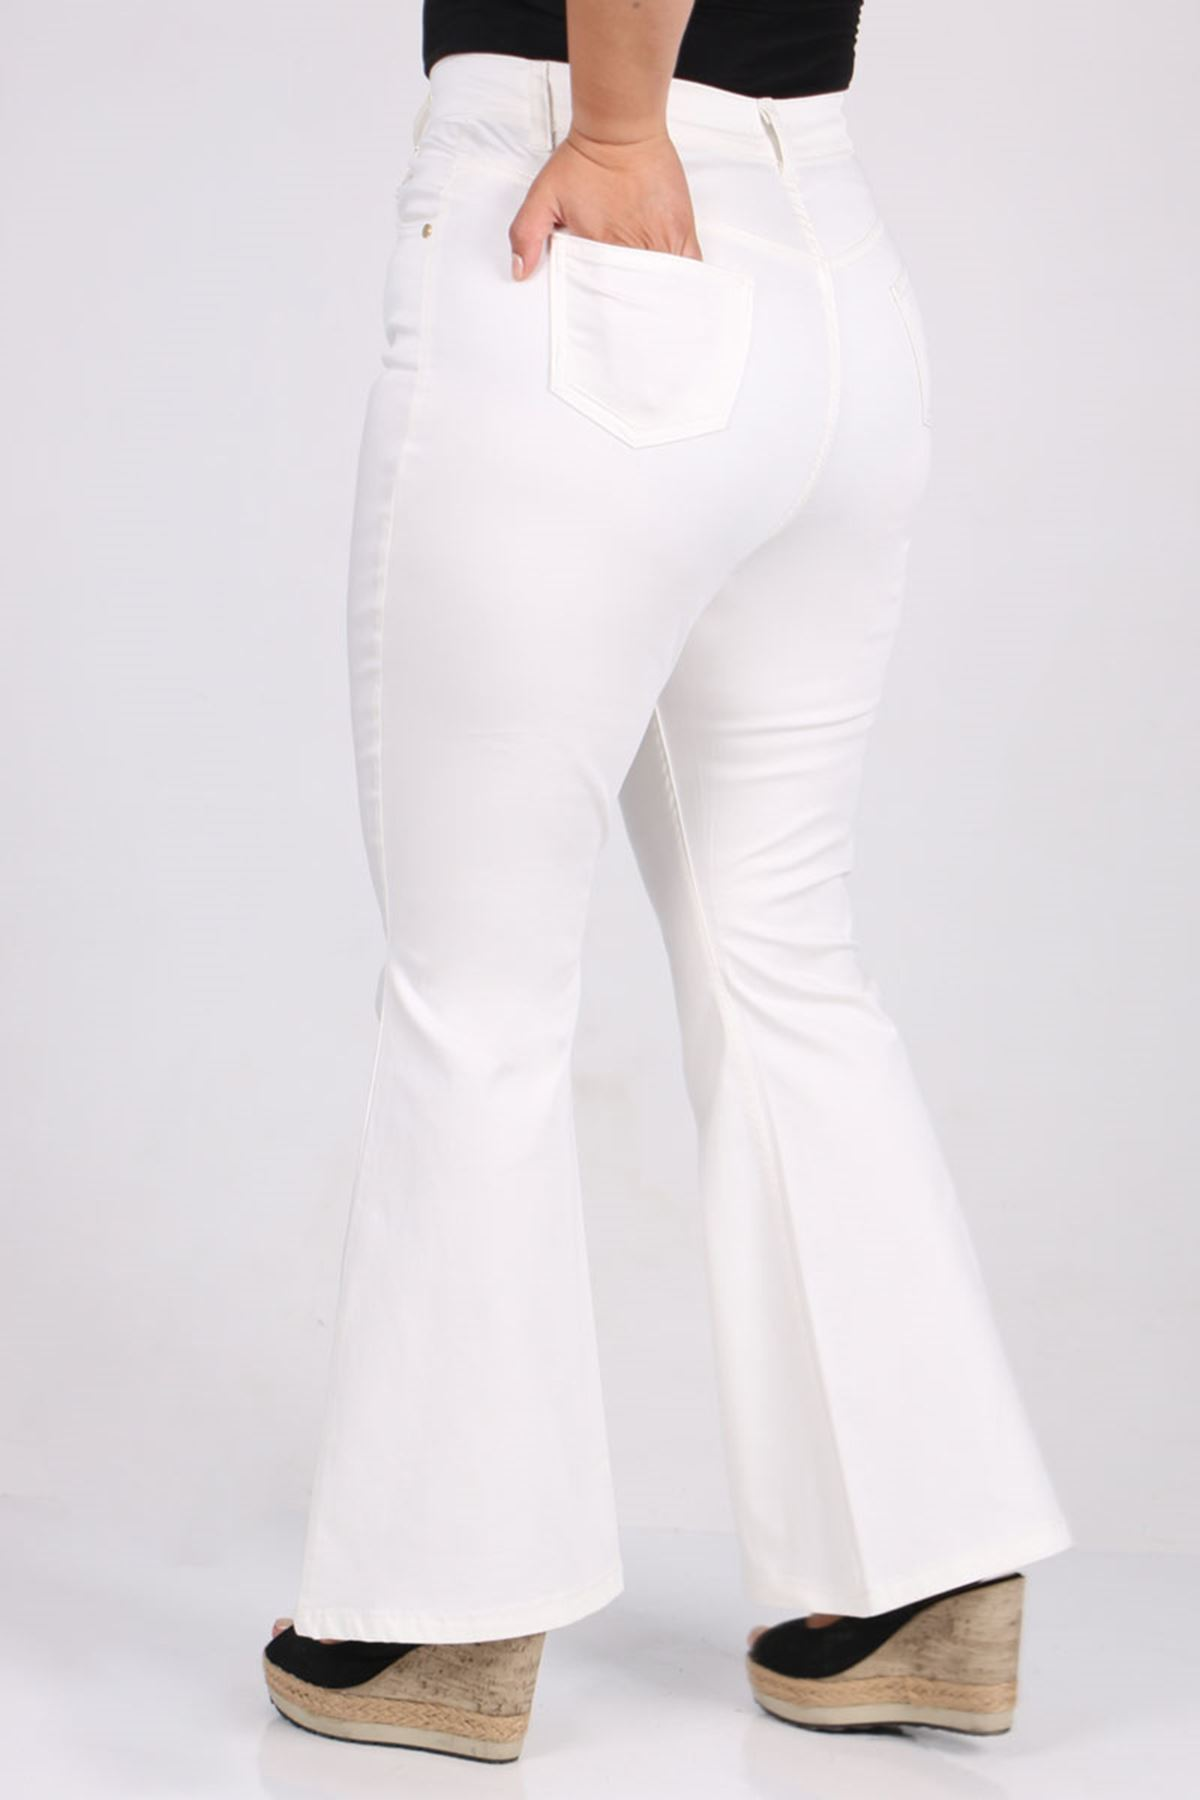 9110 Büyük Beden İspanyol Paça Kot Pantolon - Beyaz